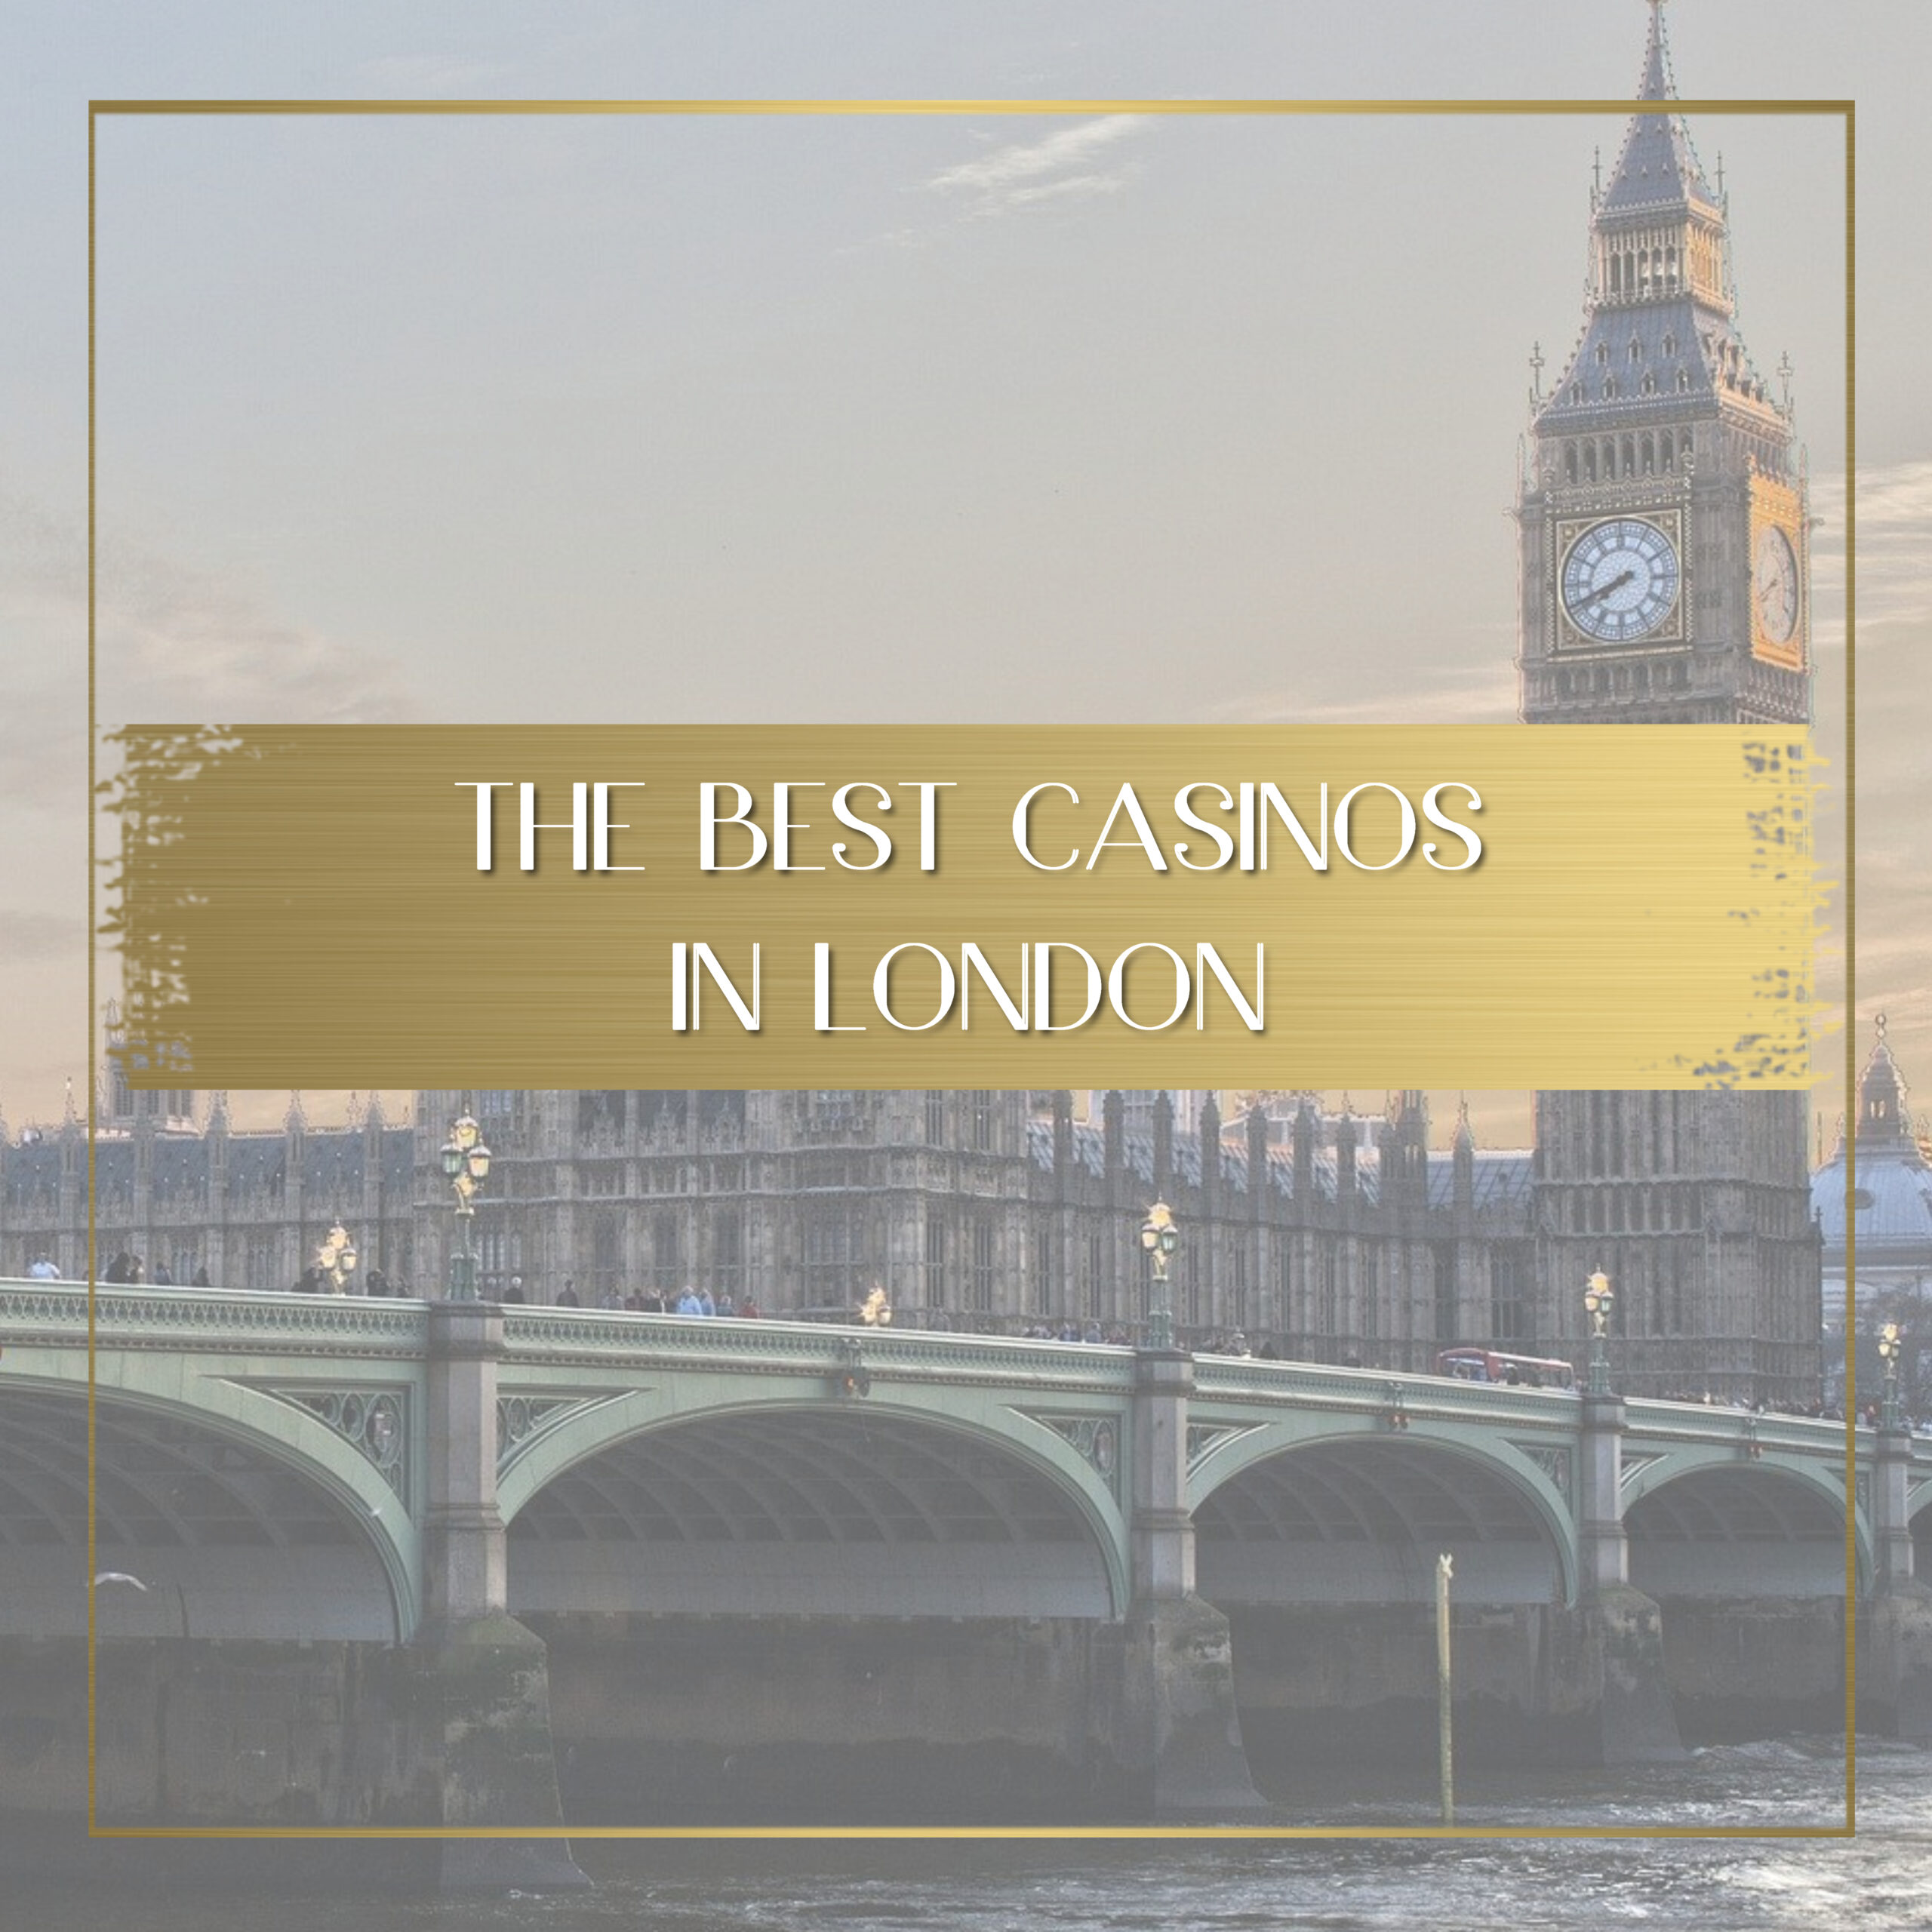 Best casinos in London feature